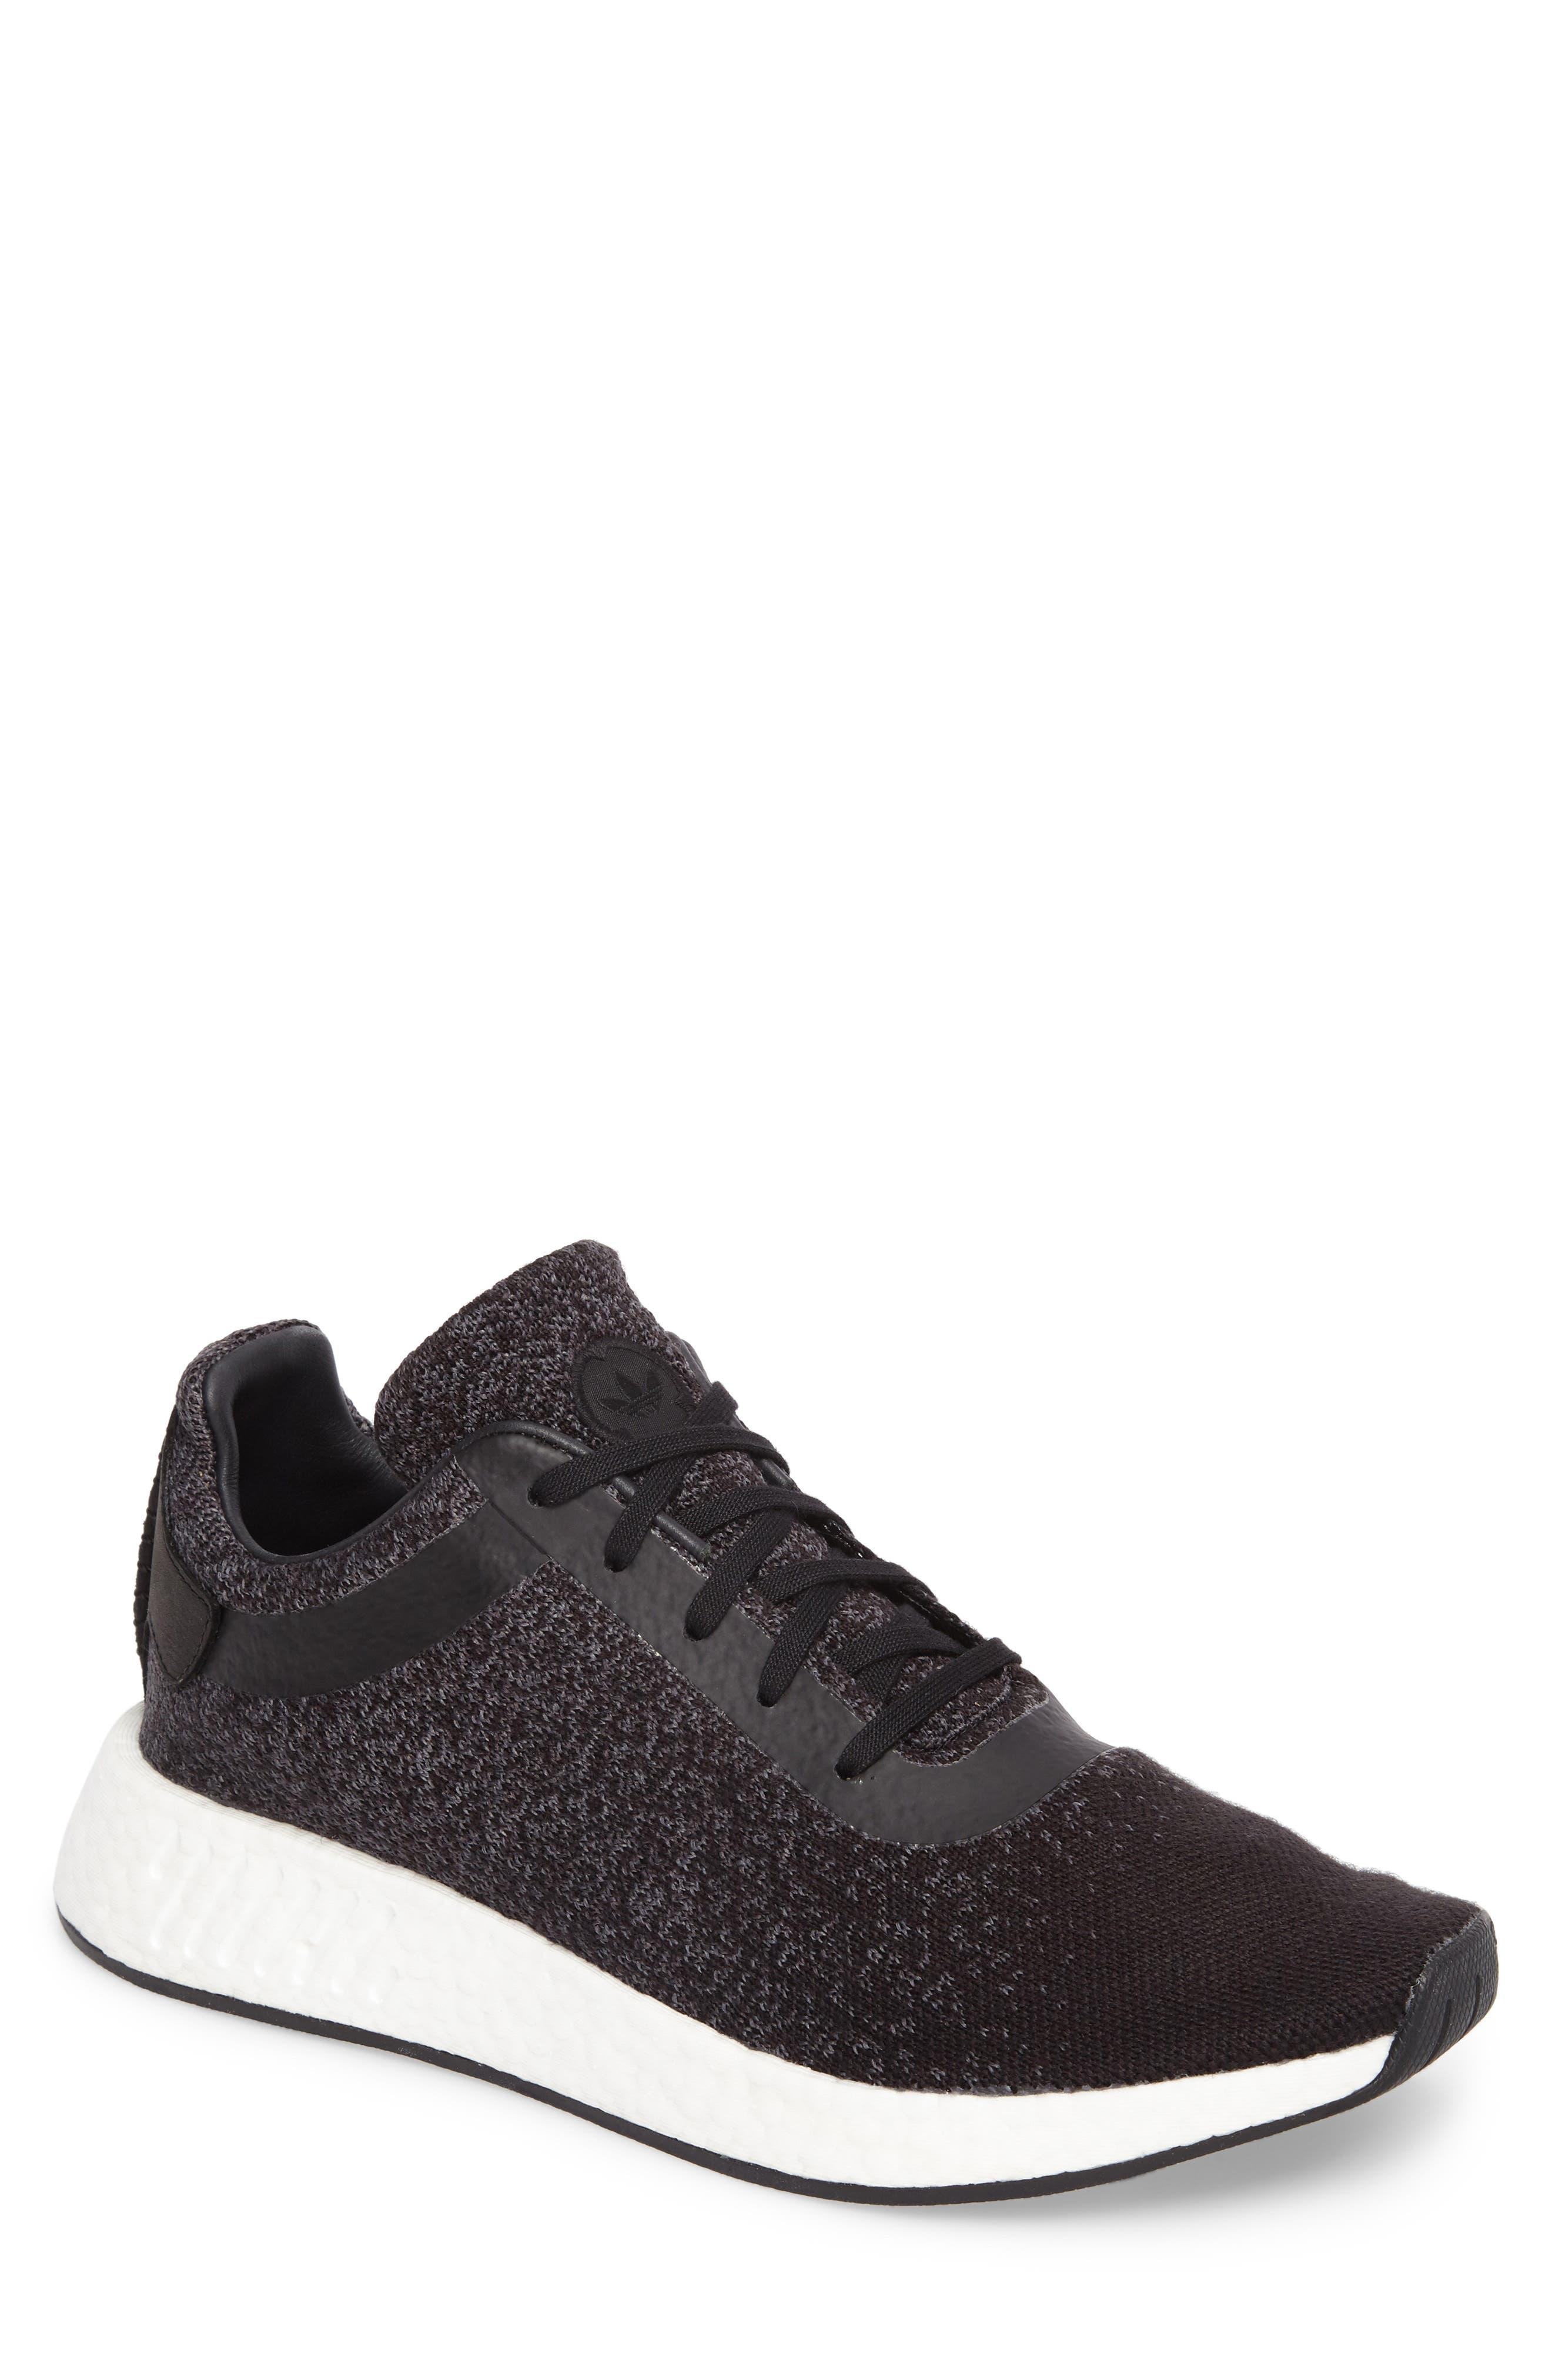 Main Image - adidas x wings + horns Primeknit NMD_R2 Sneaker (Men)